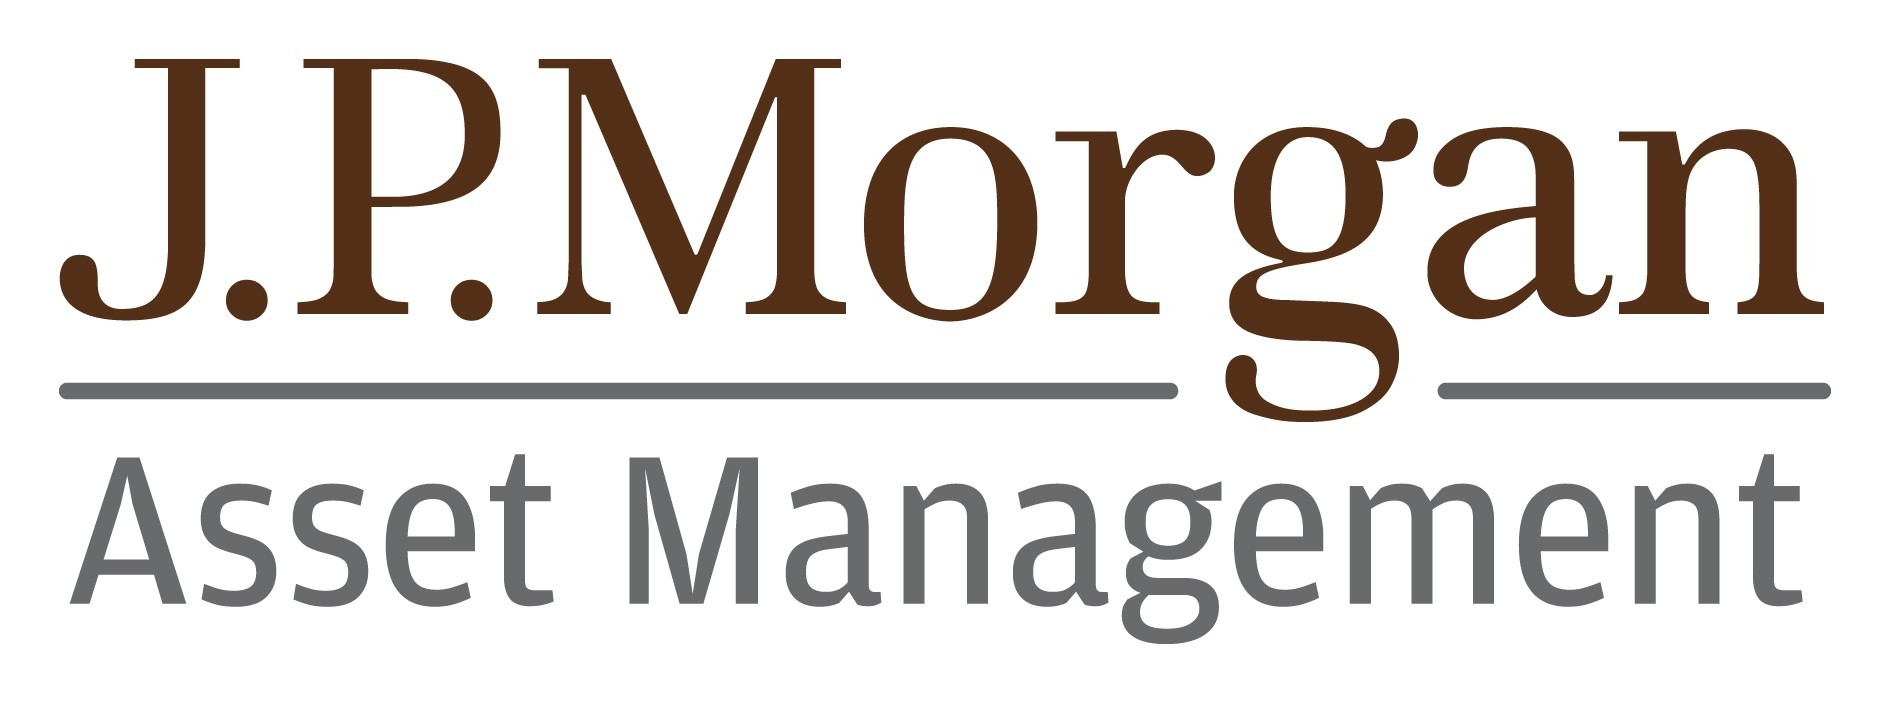 Gregson of JP Morgan says Mineral companies should seek ... J.p. Morgan Logo